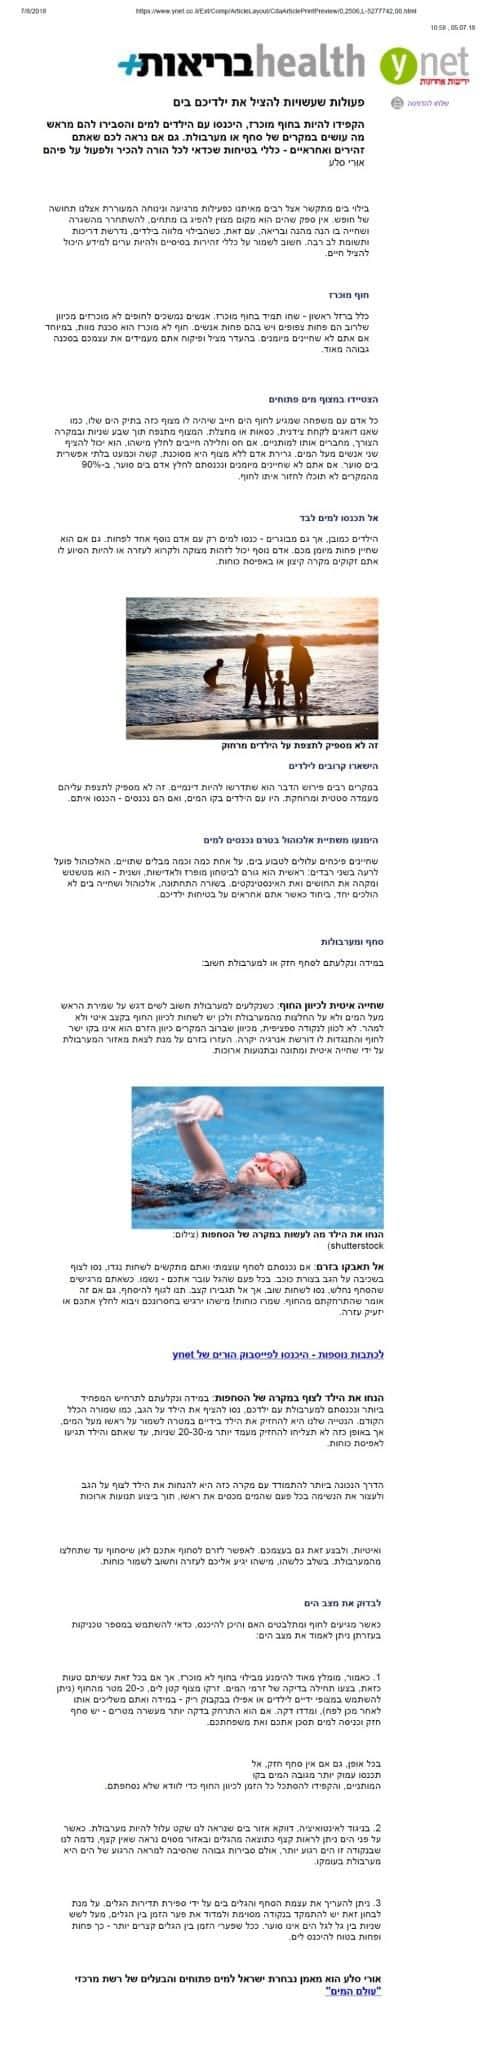 ynet: פעולות שעשויות להציל את ילדכם בים